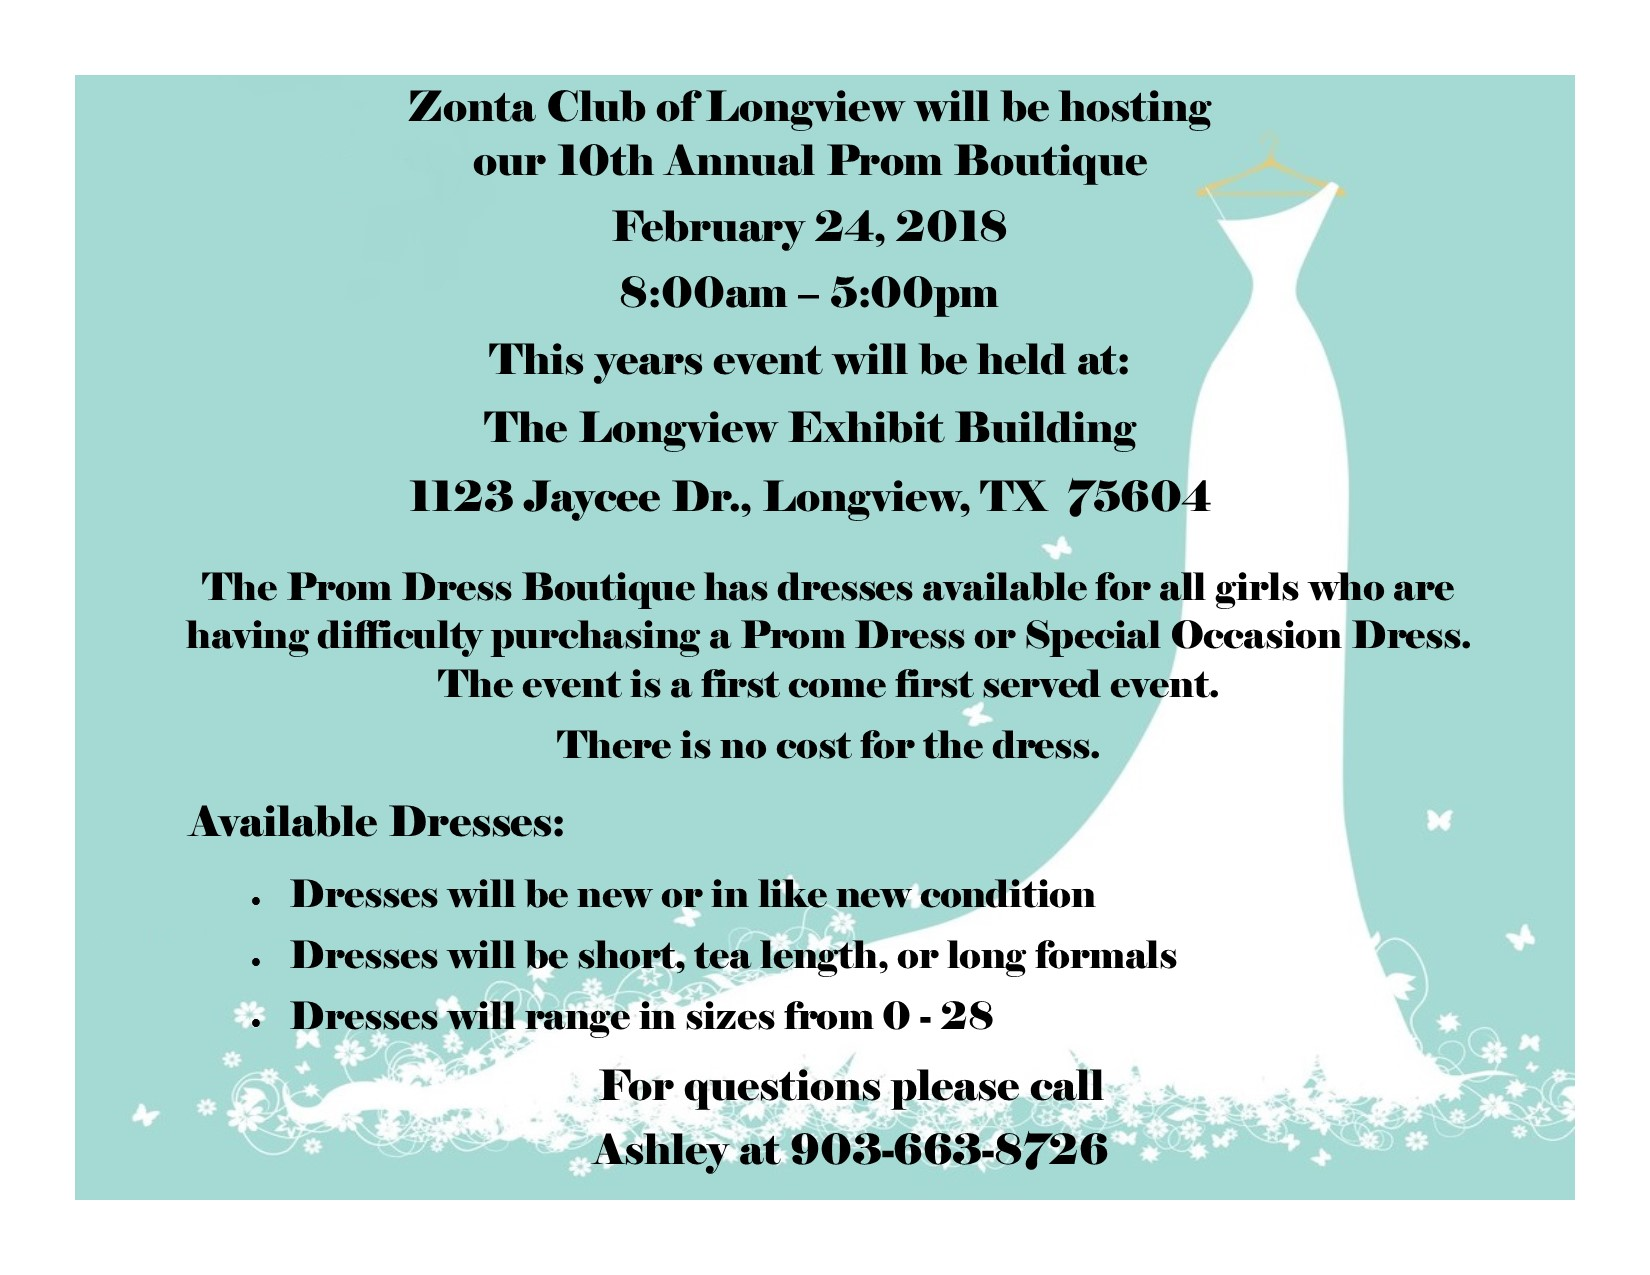 Prom Boutique - ZONTA Club of Longview